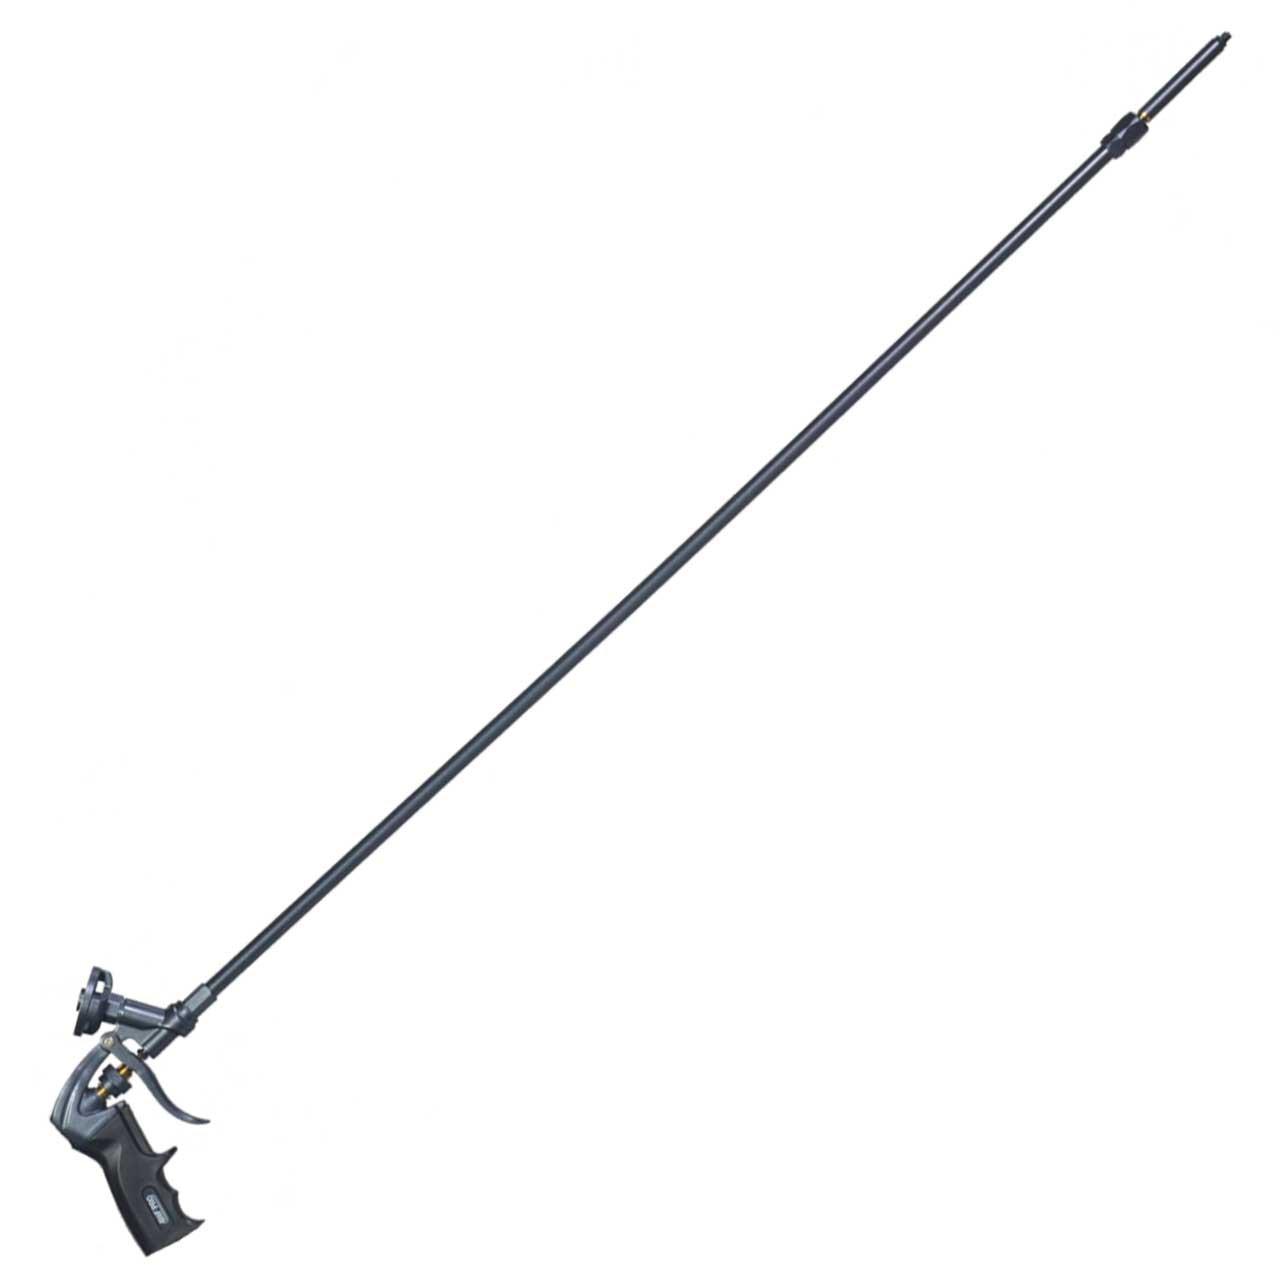 Pro Foam Gun, 40 inch (100 cm) Barrel, Swivel Tip, Teflon Coated, One Hand Adjustment, AWF Pro